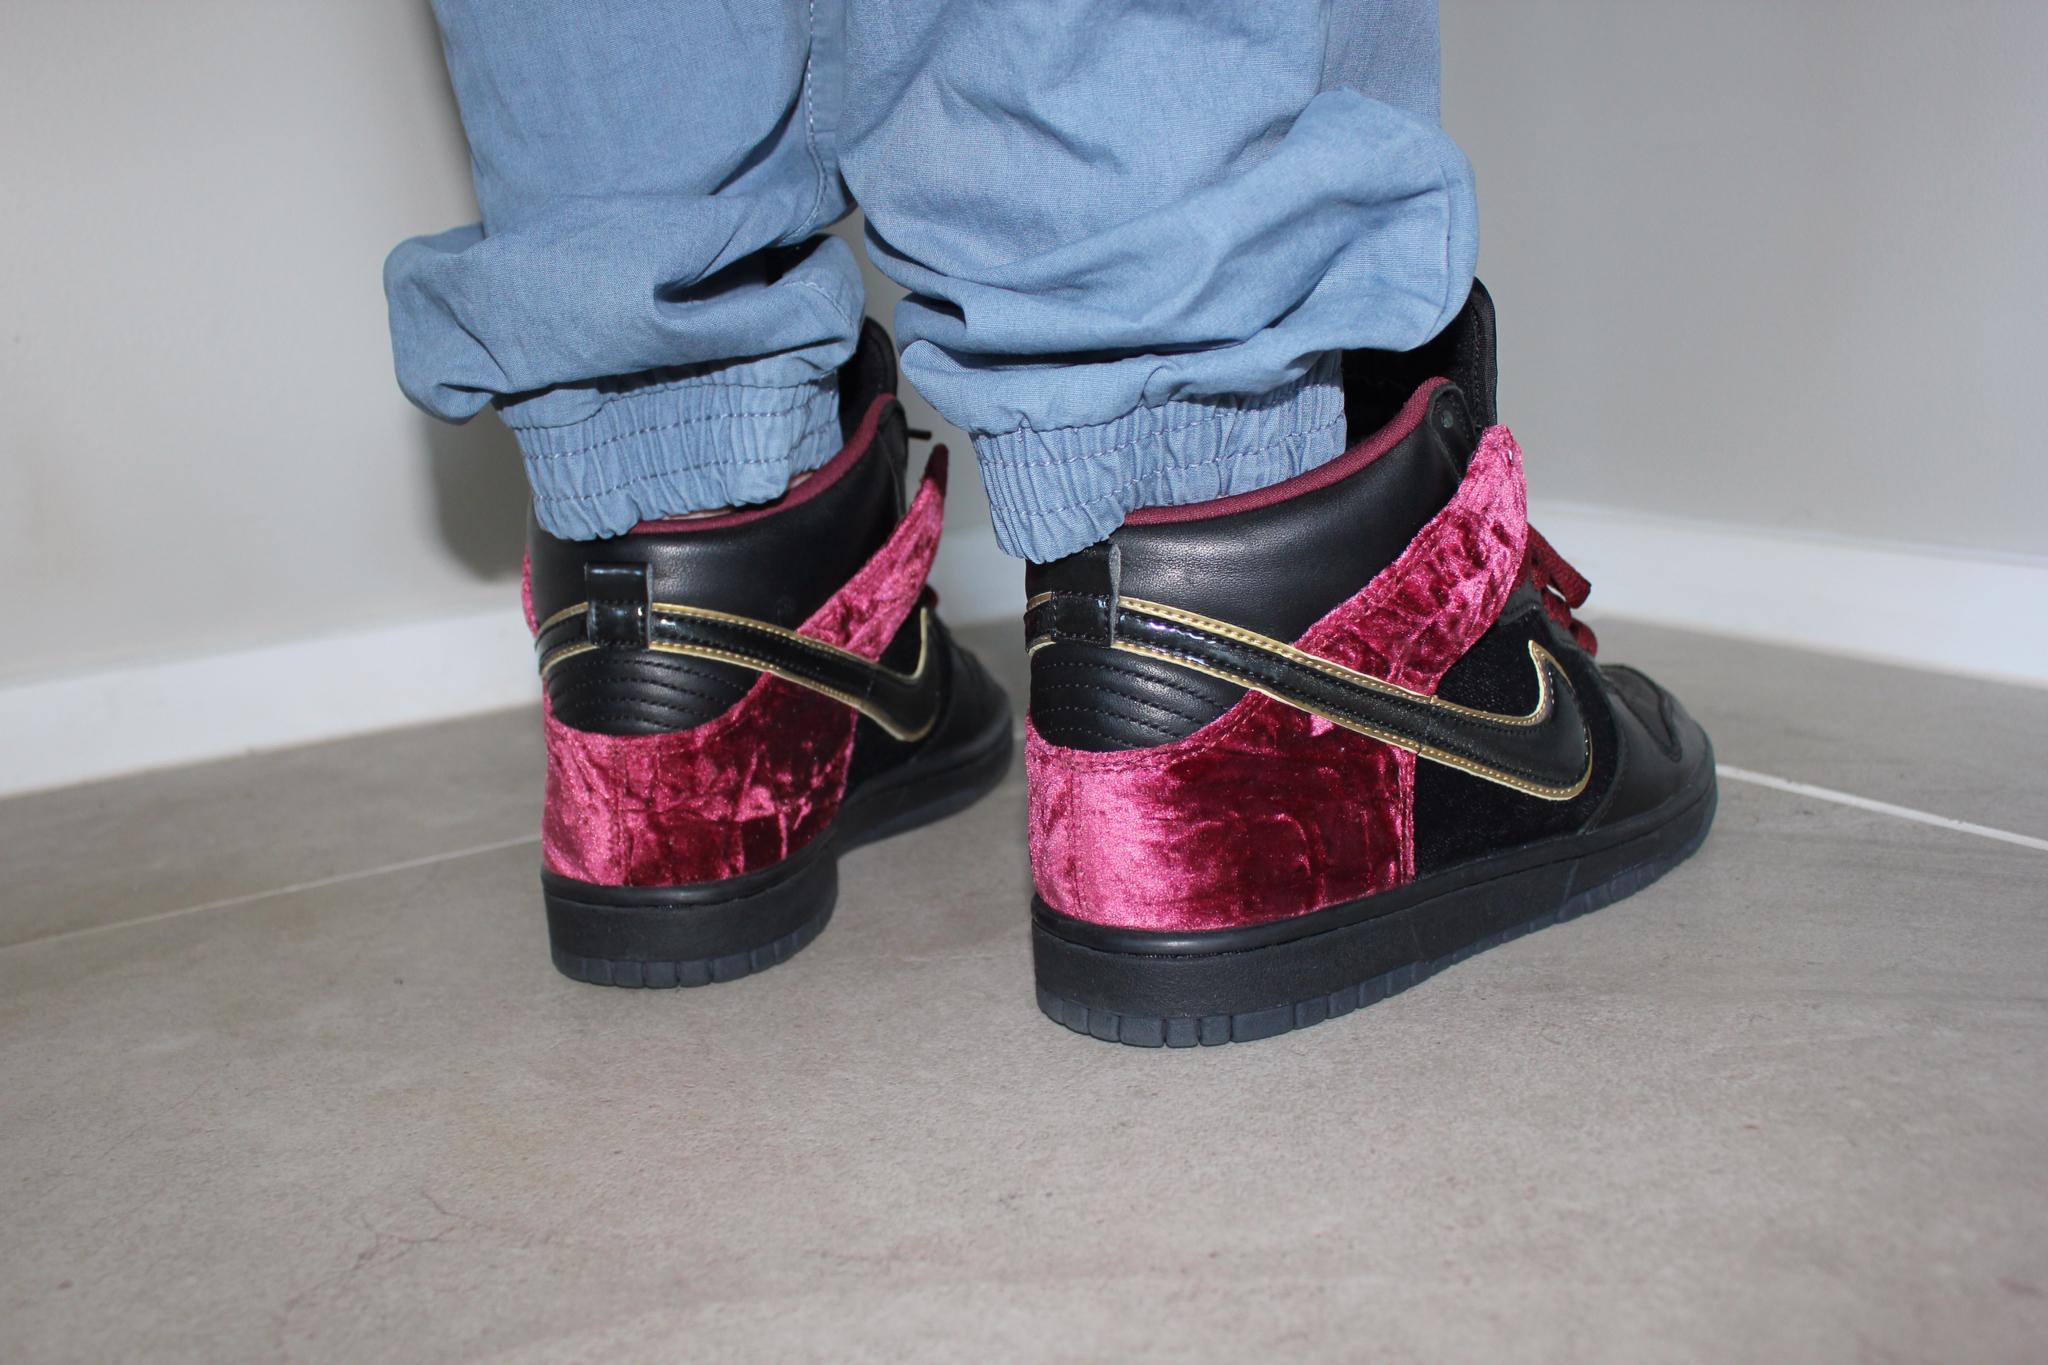 the best attitude cdc73 0e4b6 Tags Bloody Sunday, Dunk, High, Nike SB, Nike, On Feet, QS, Quickstrike,  Skateboarding, U2